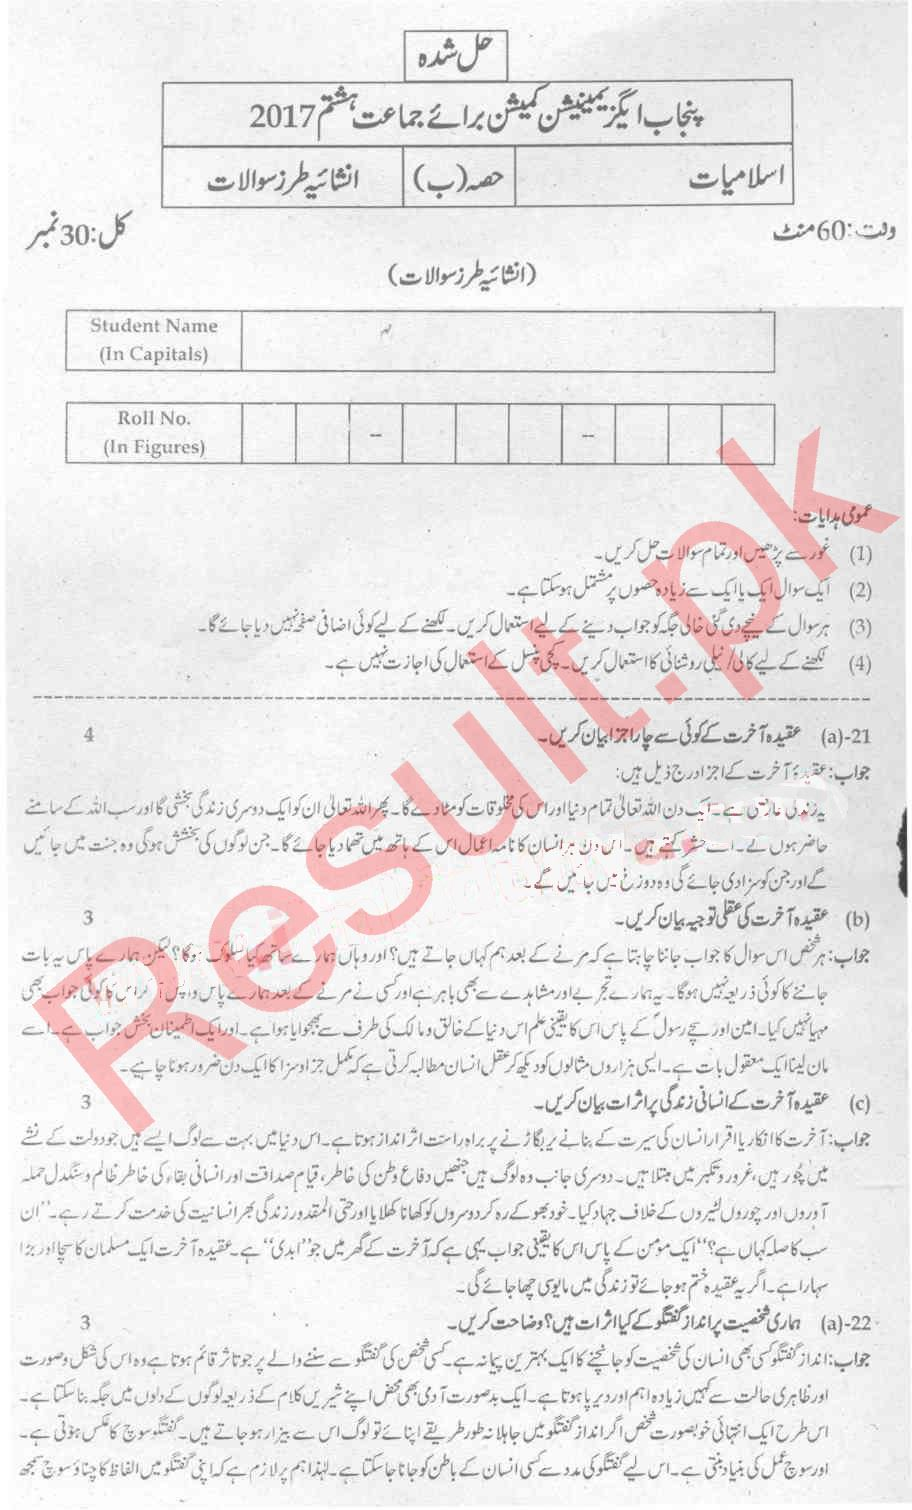 Punjab Education Commission Past Paper 2018 8th Class, Grade